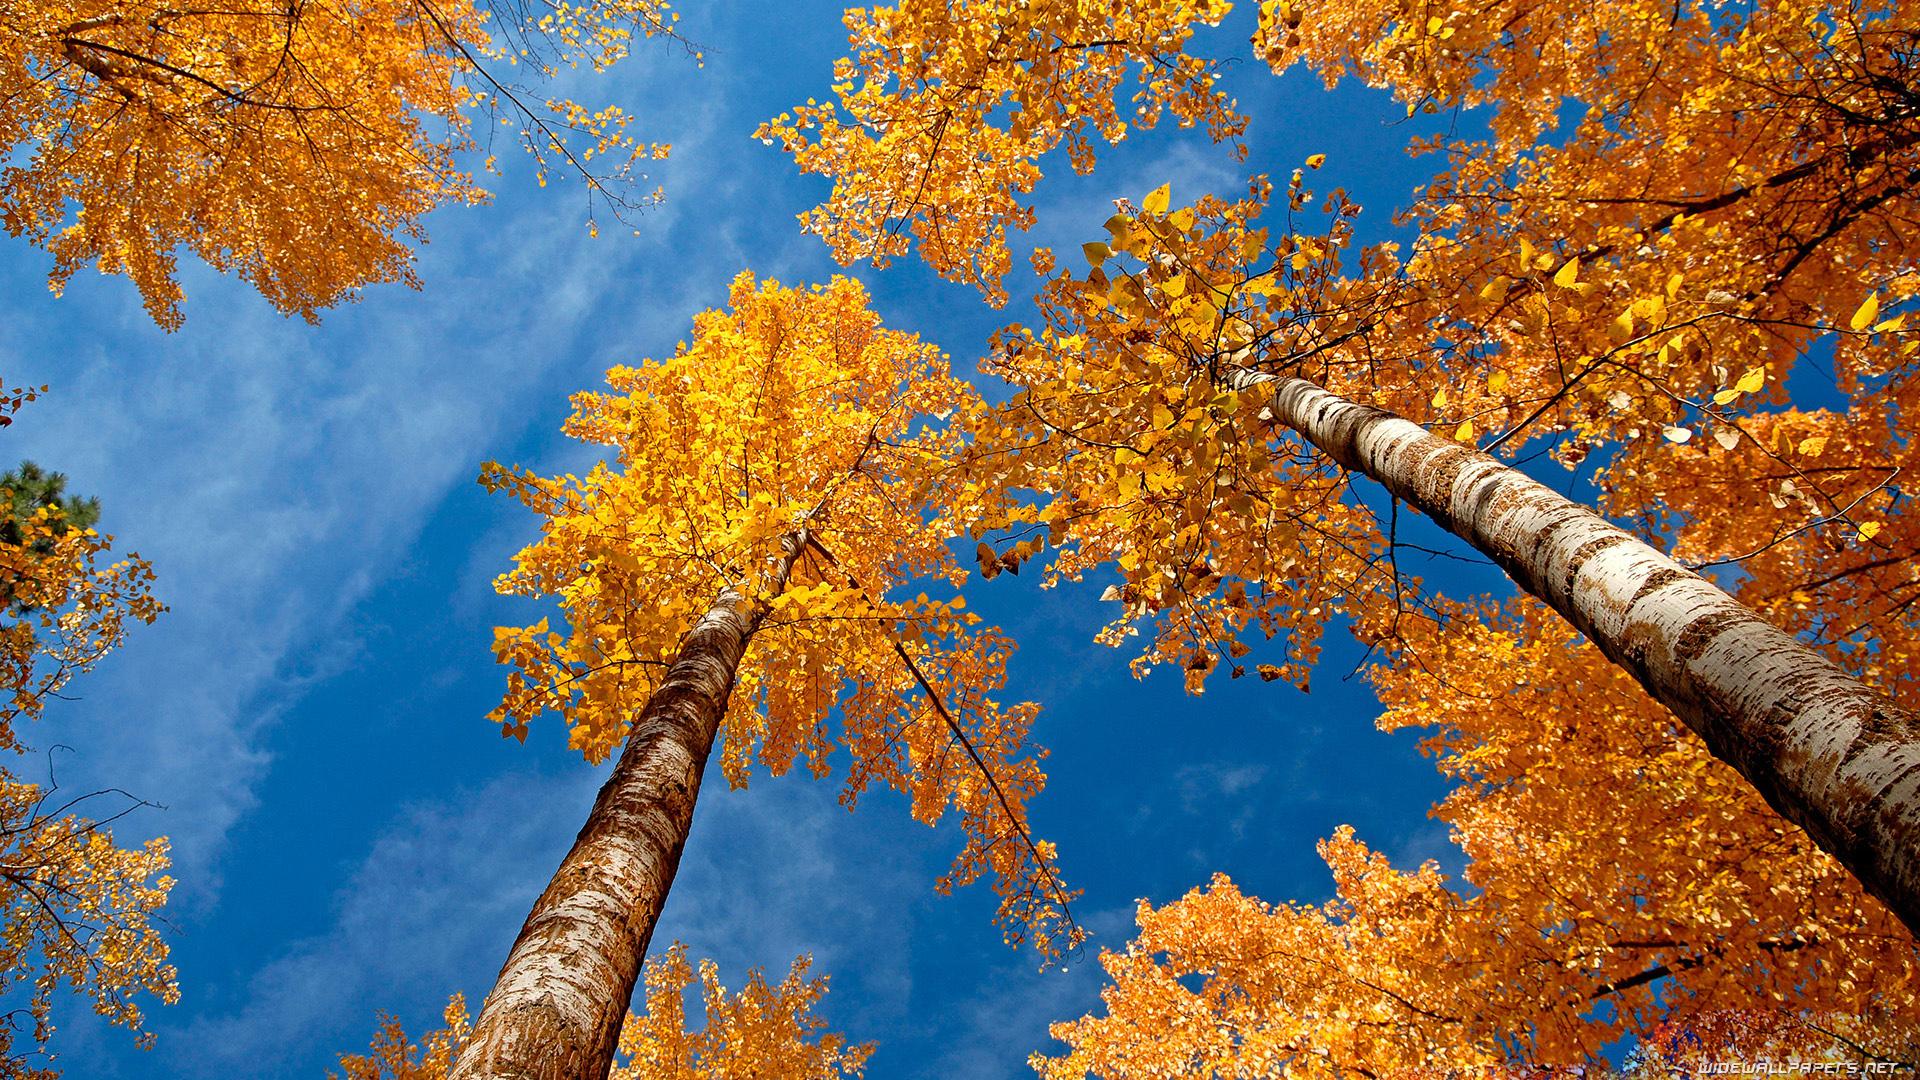 autumn trees pictures